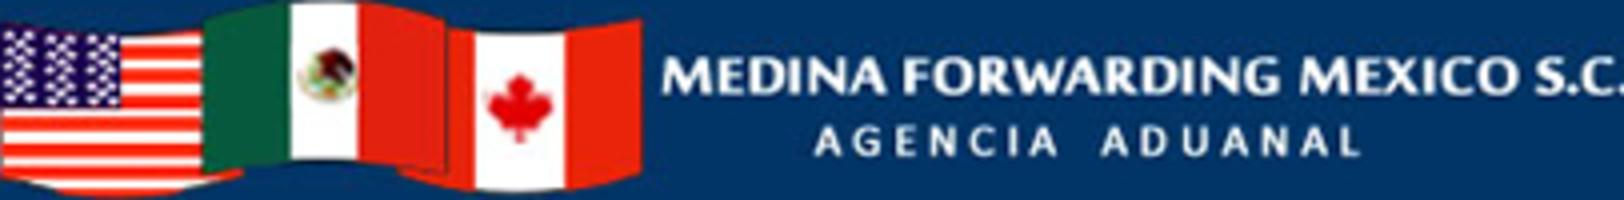 Medina Forwarding